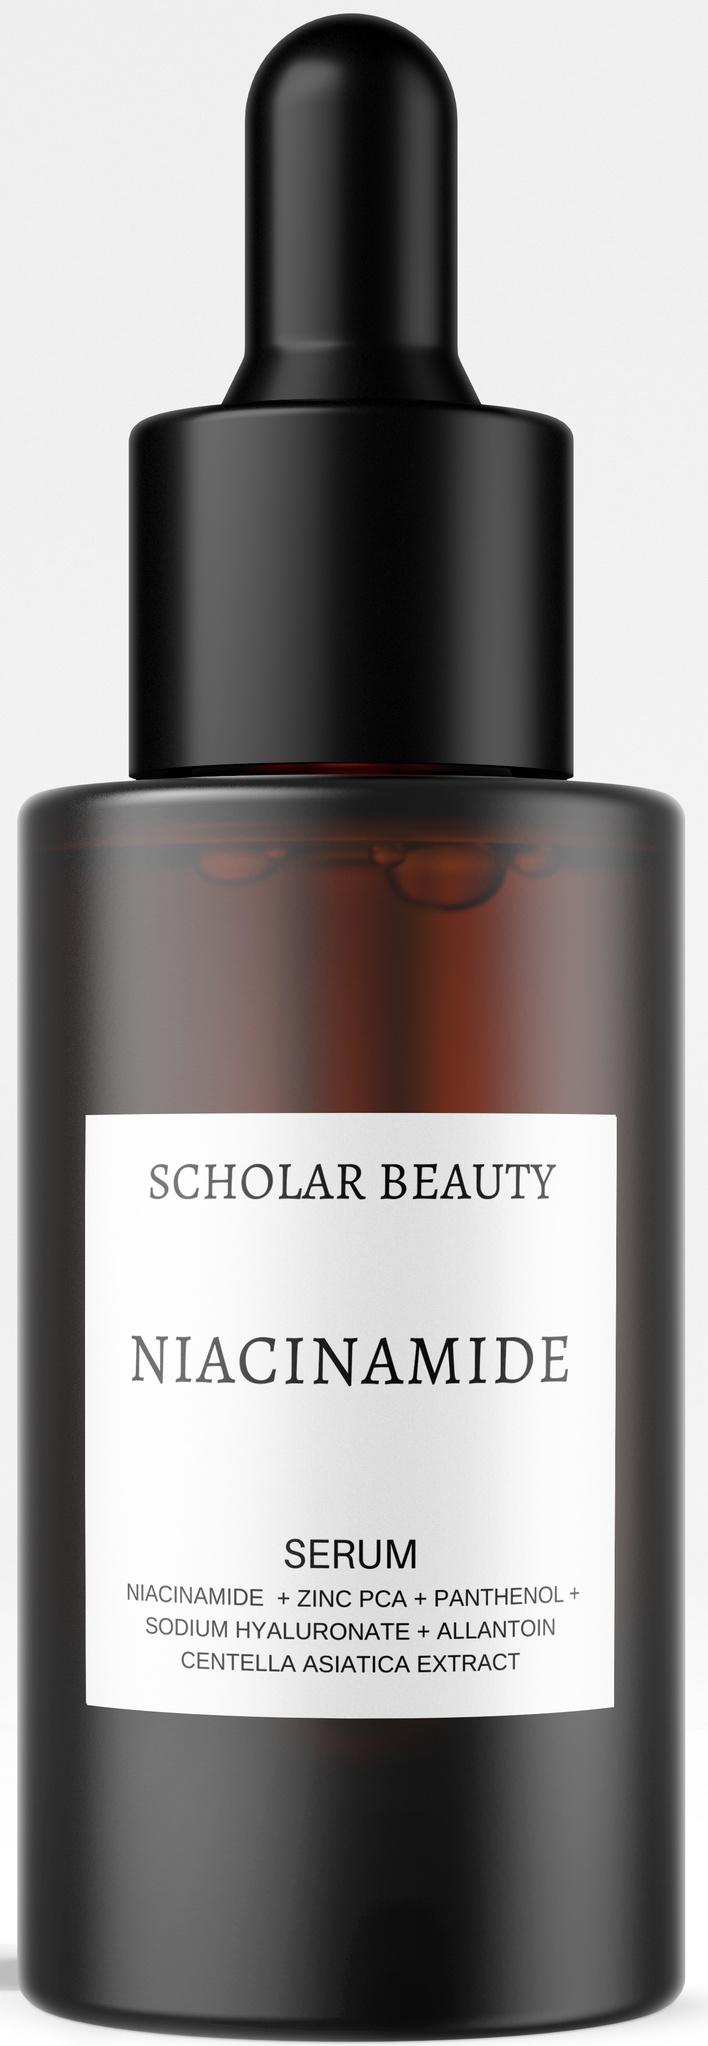 Scholar Beauty Scholar Beauty Niacinamide Serum